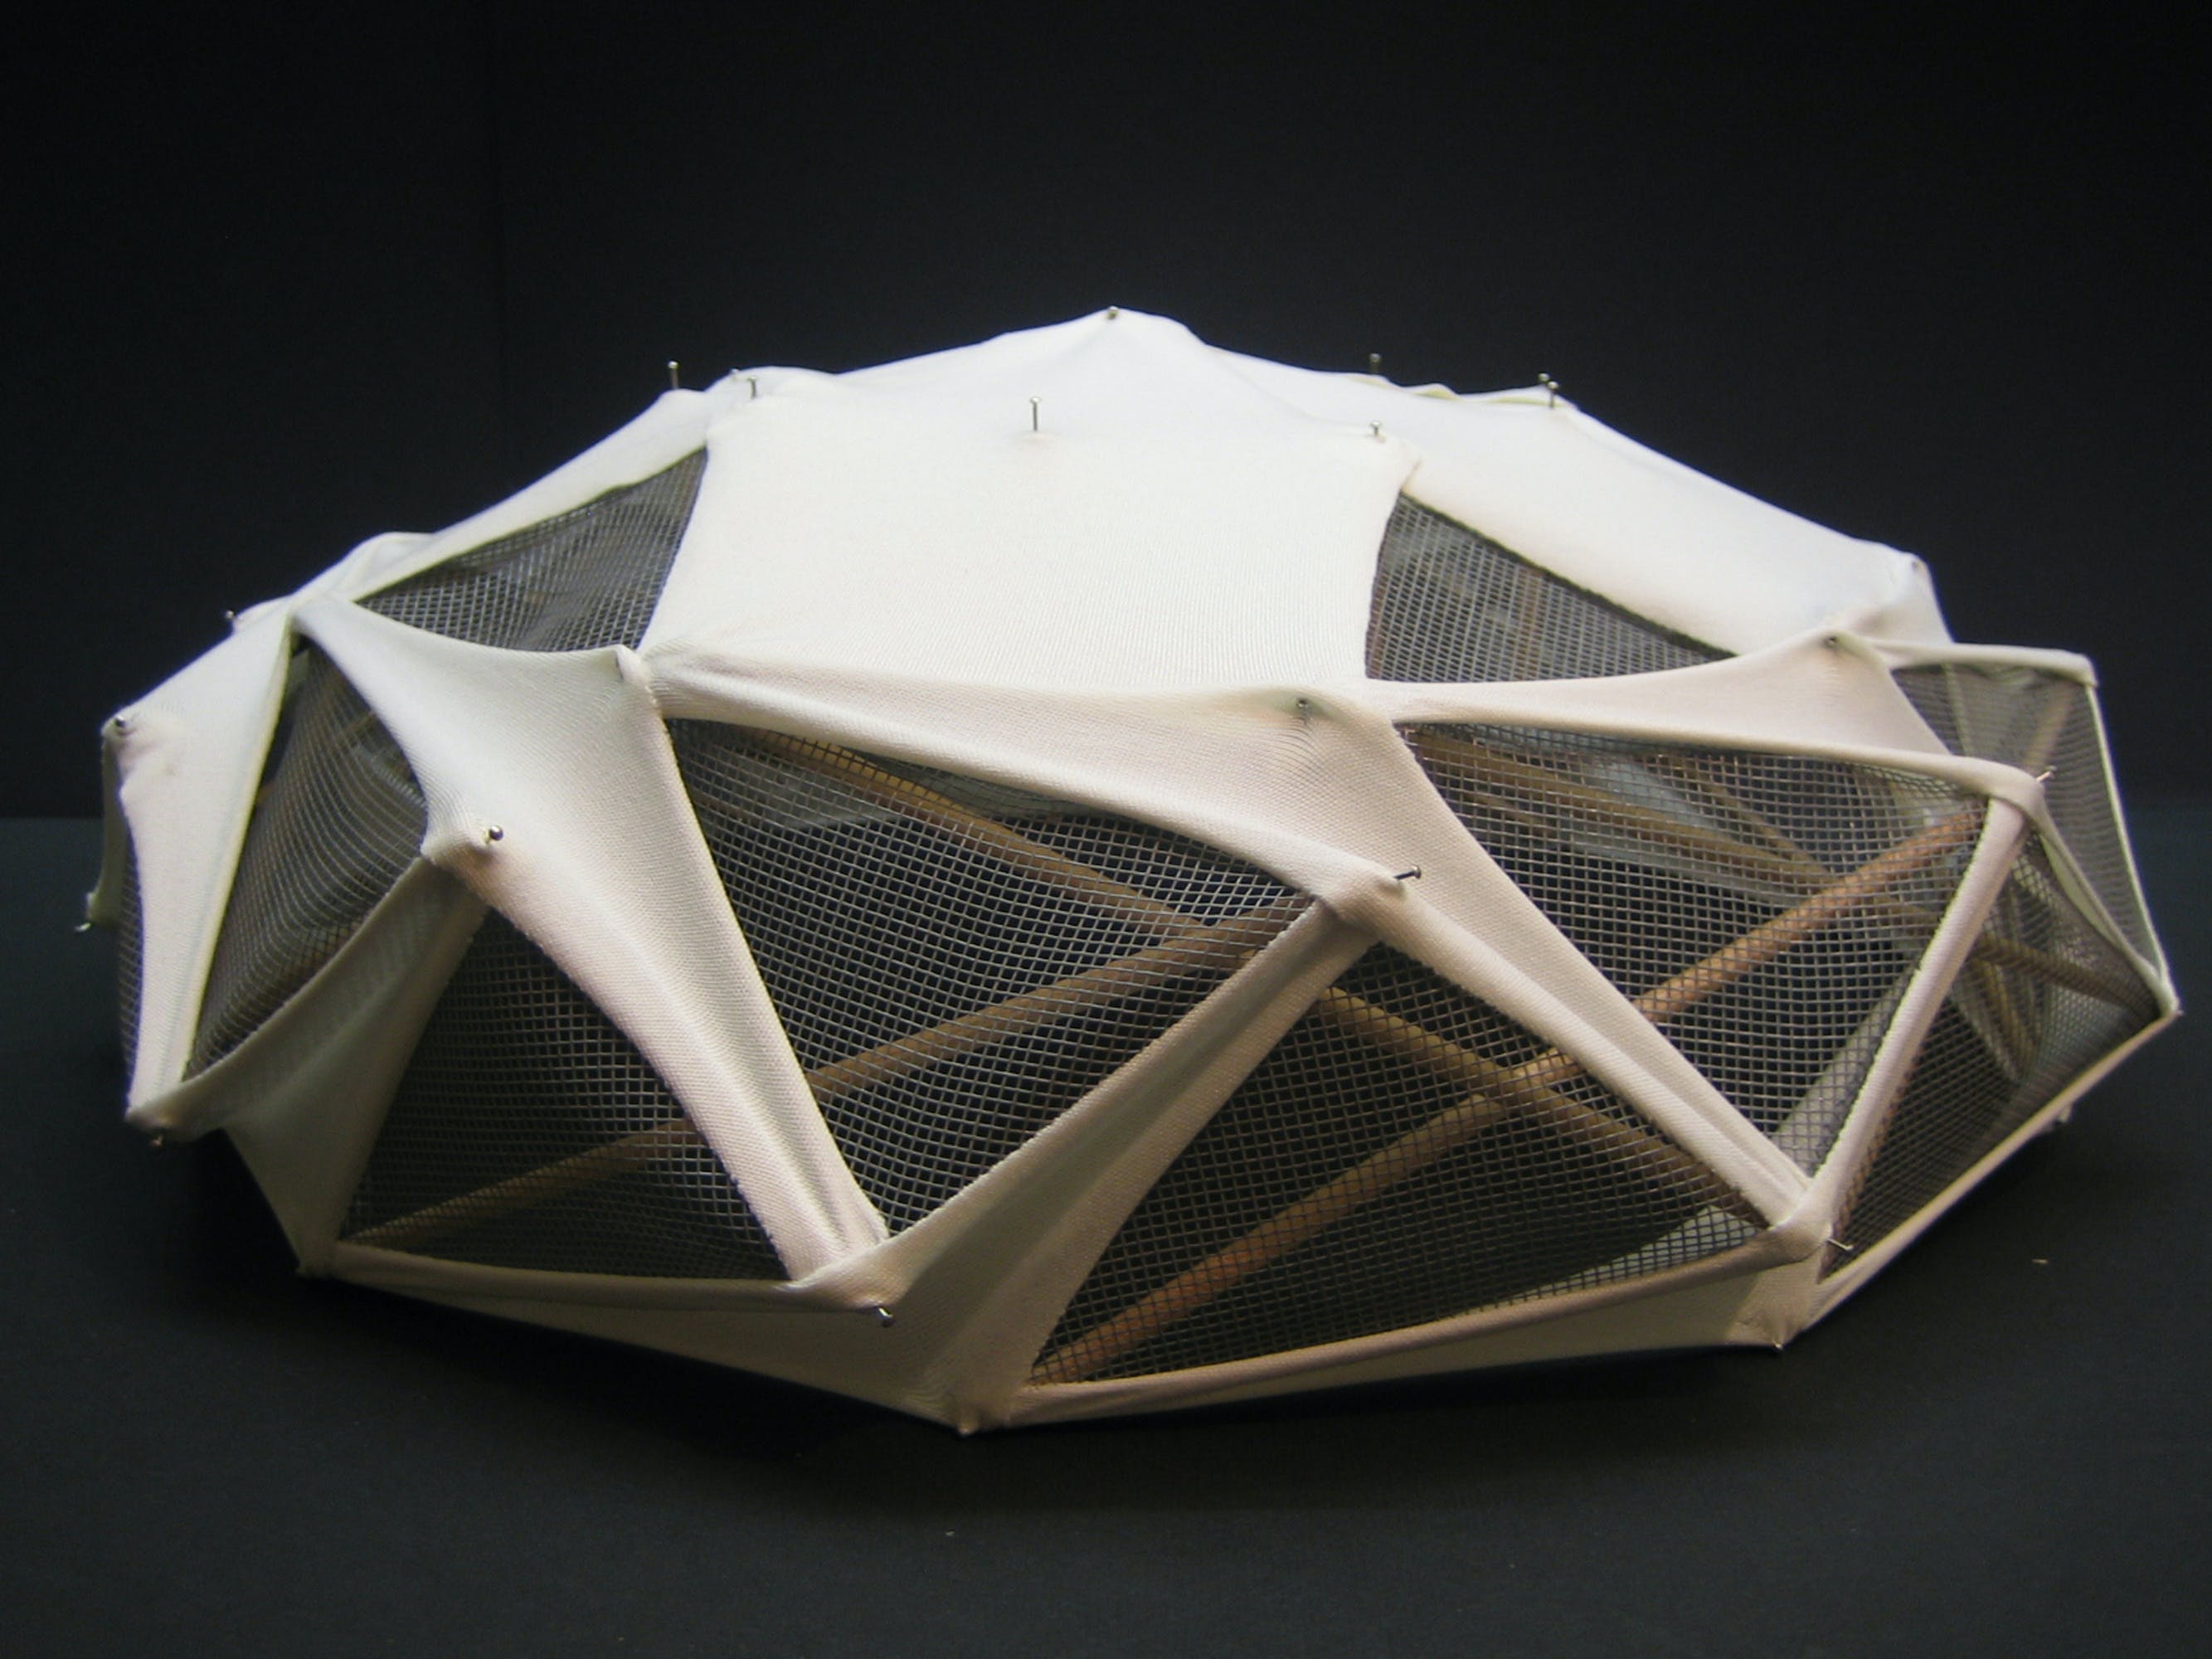 tensegrity dome